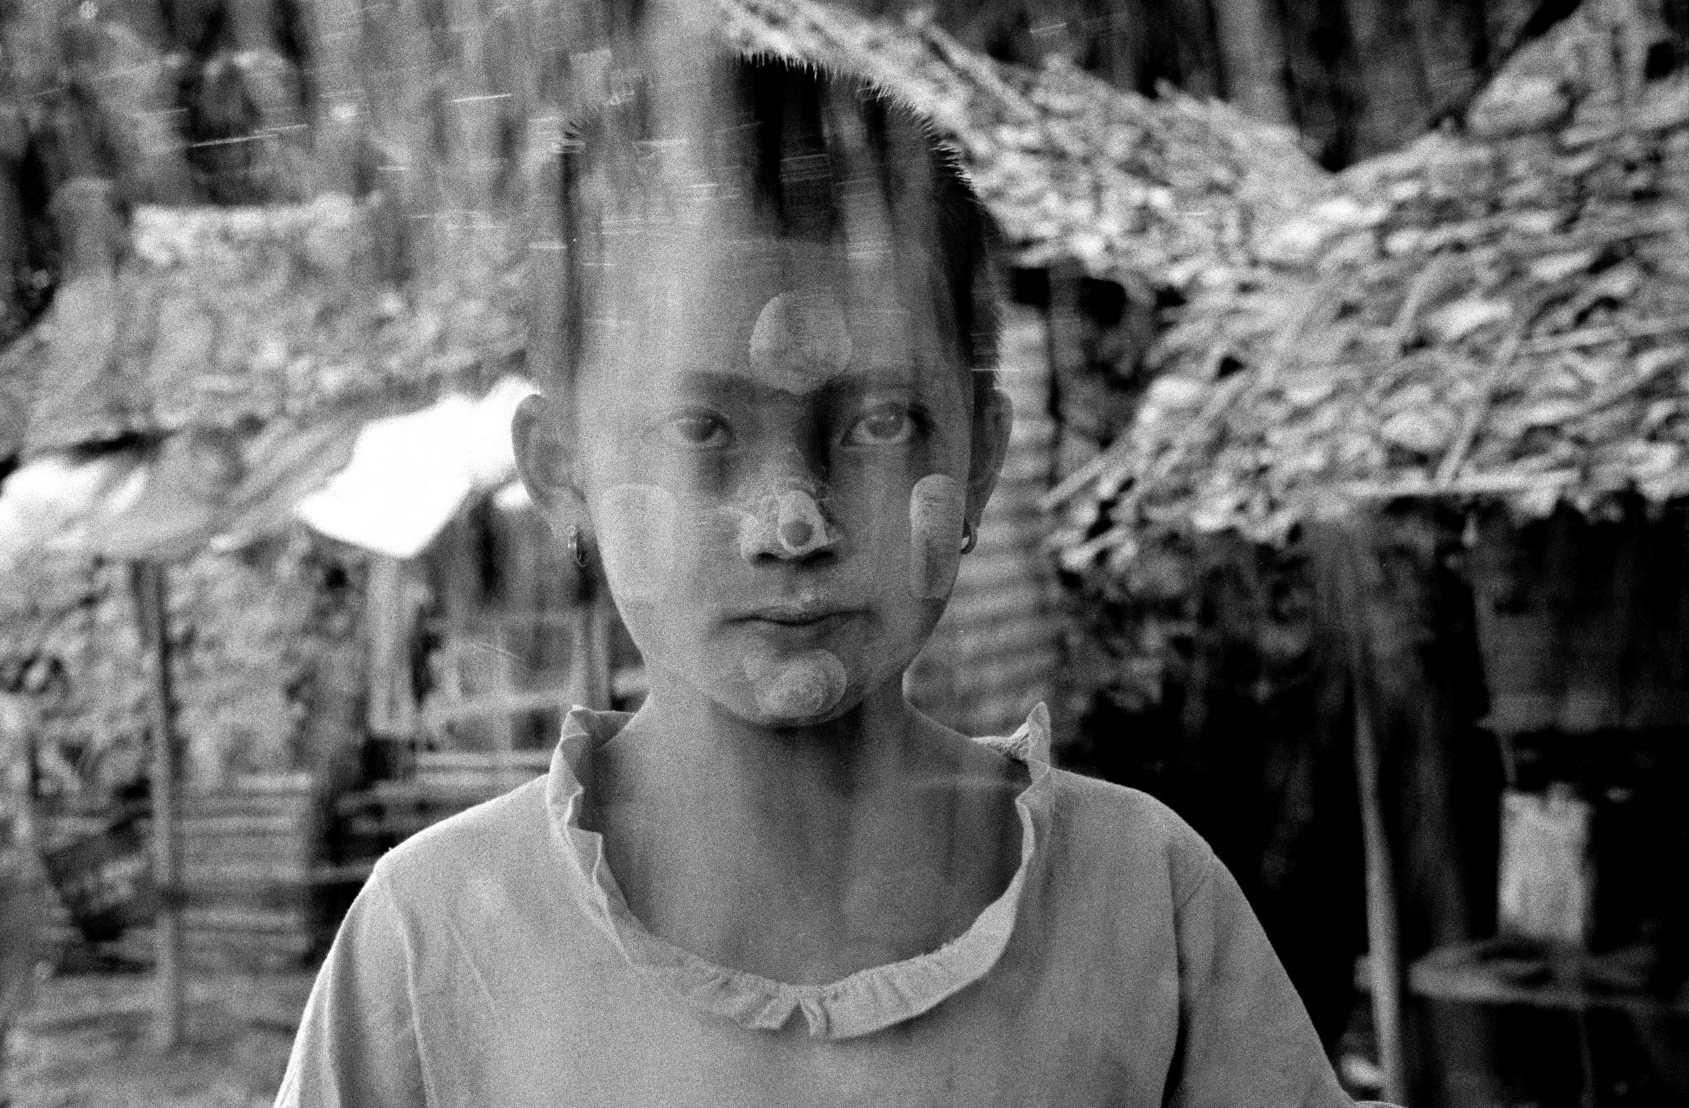 Malnourished. Mae Sot, Thailand. 2001